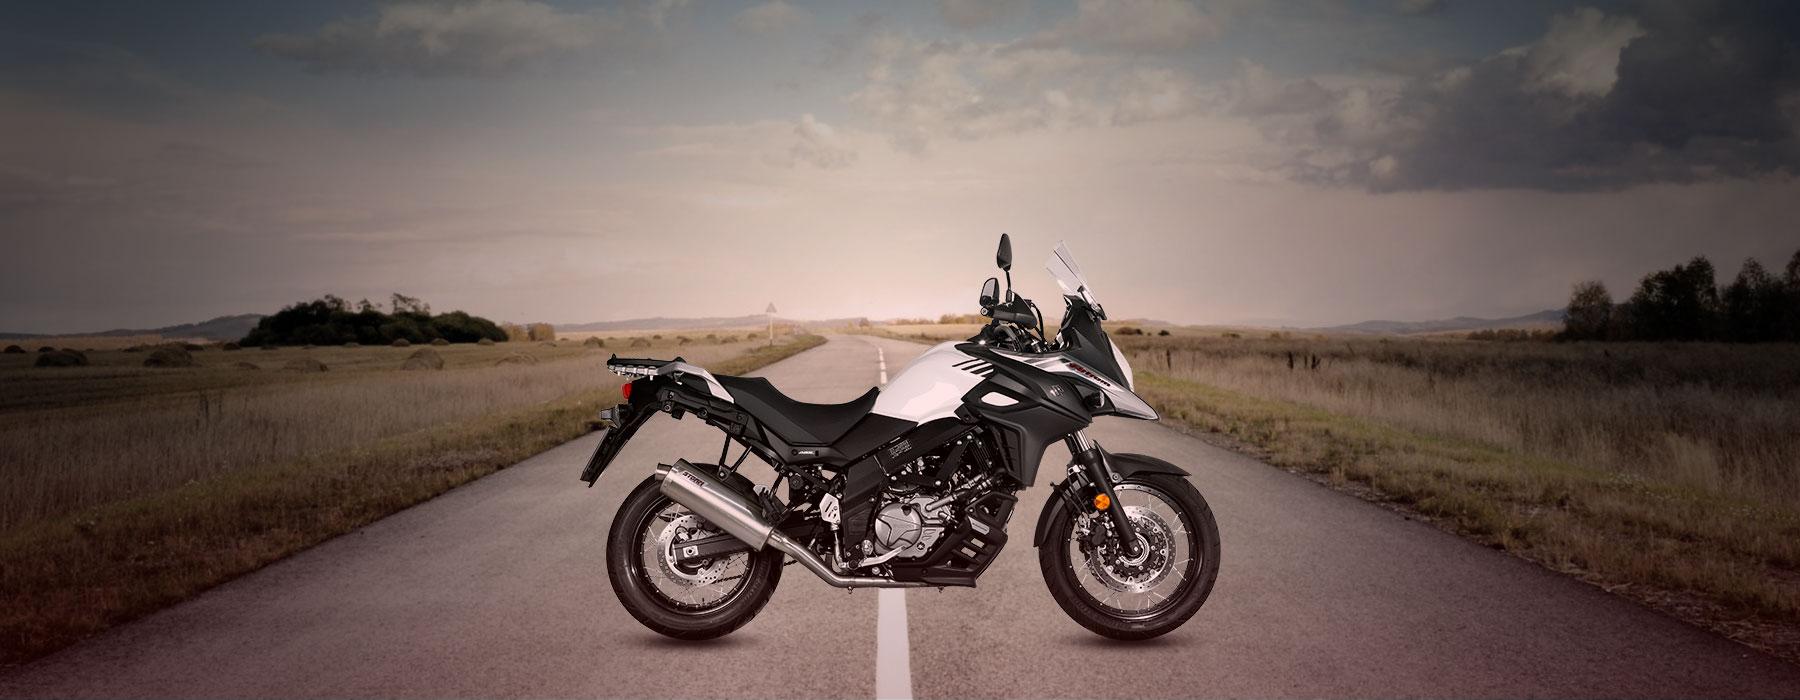 Bike exhaust, Motorcycle exhaust, Motorbike muffler - Storm